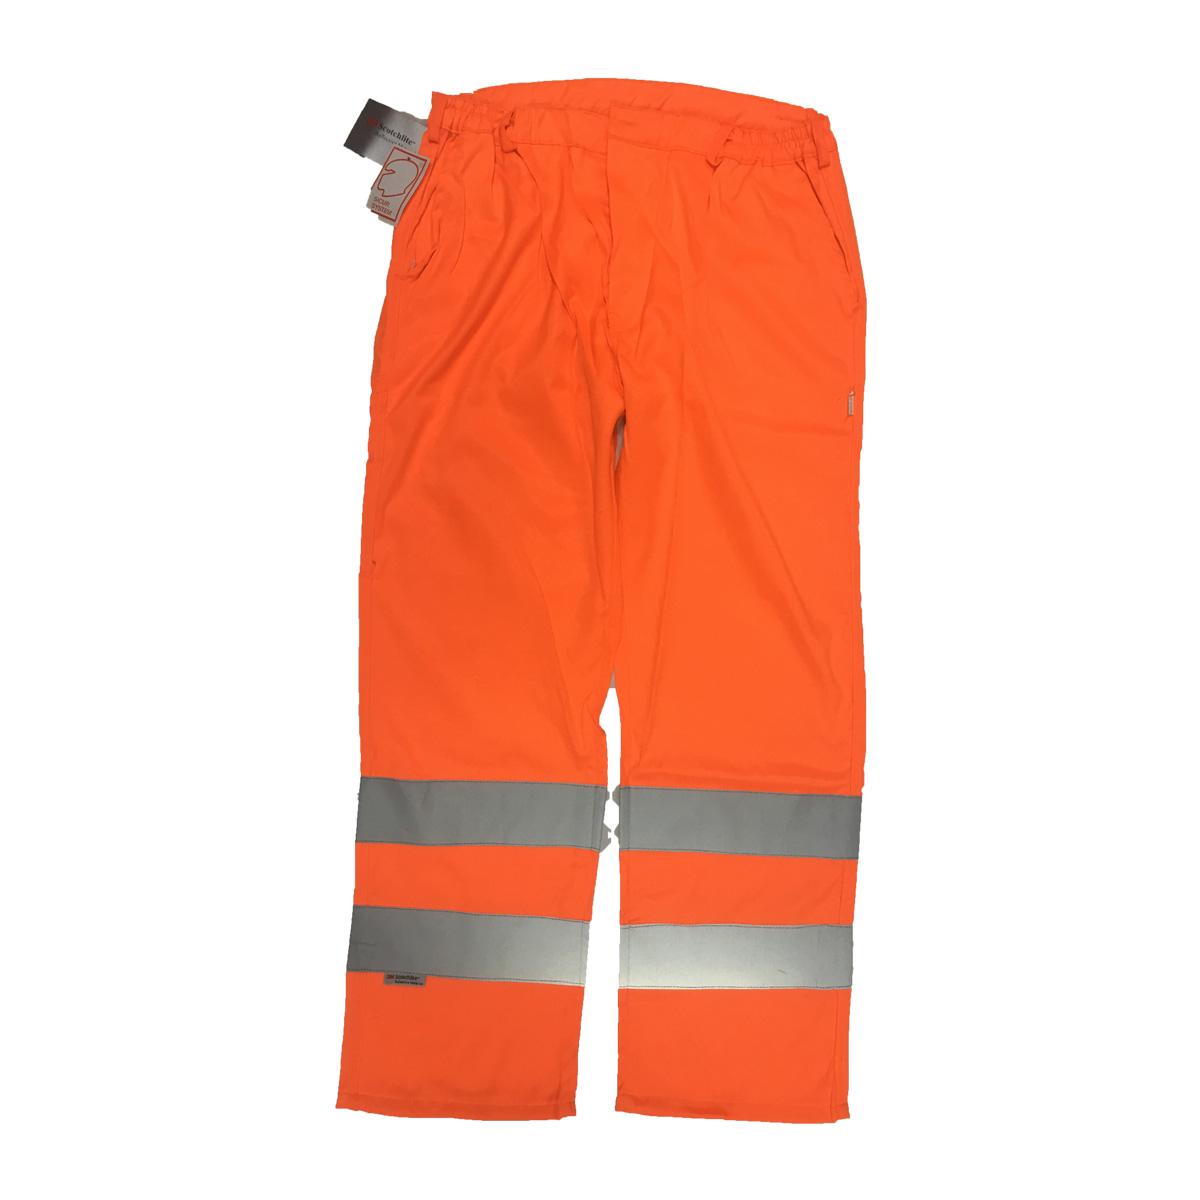 Pantalone fluo SICUR